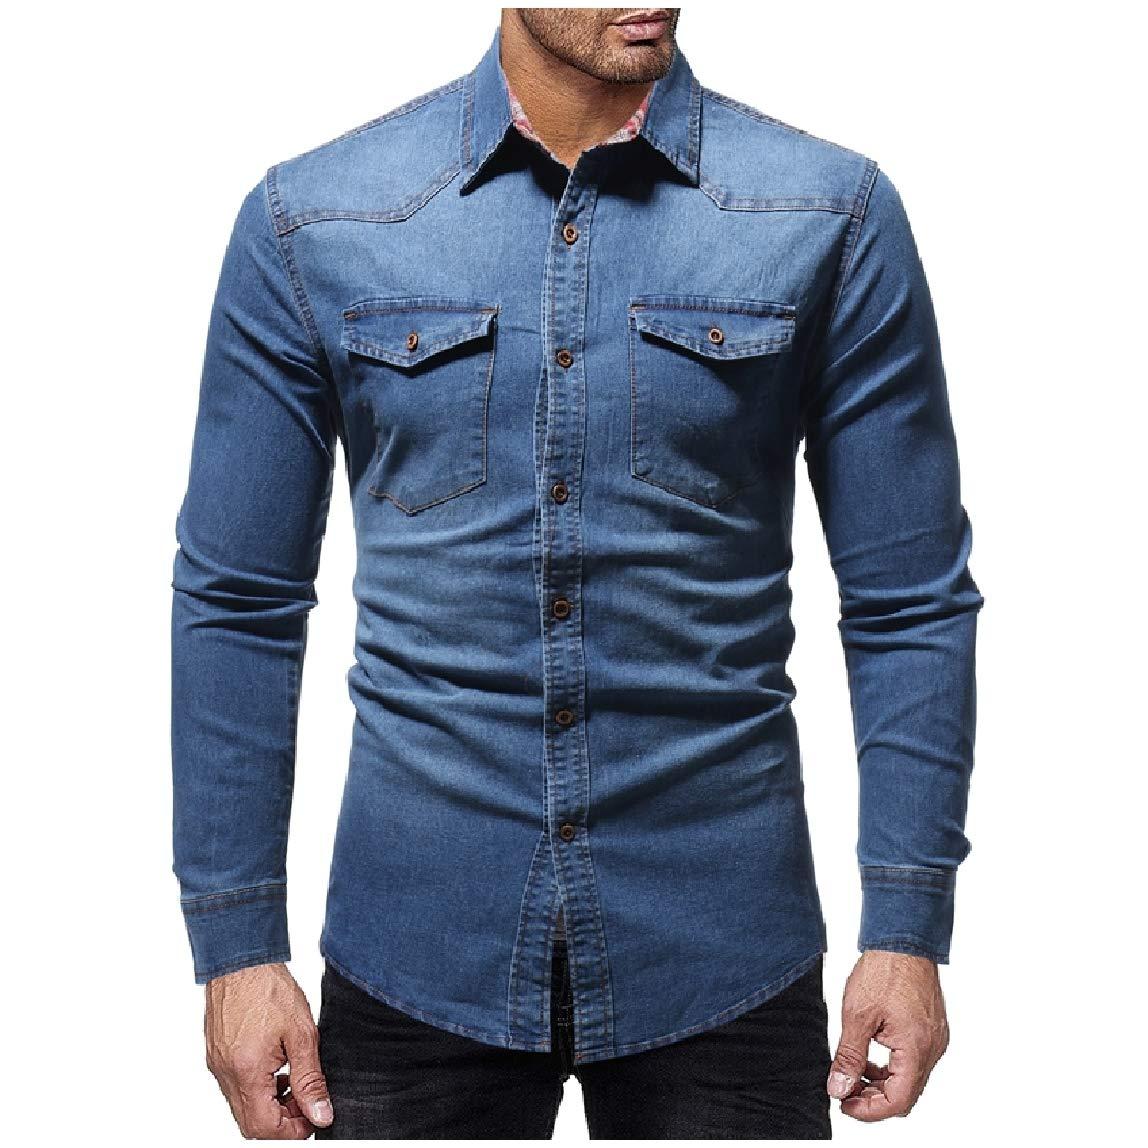 Mirrliy Mens Winter Casual Turn Down Collar Long-Sleeve Regular-Fit Denim Shirt